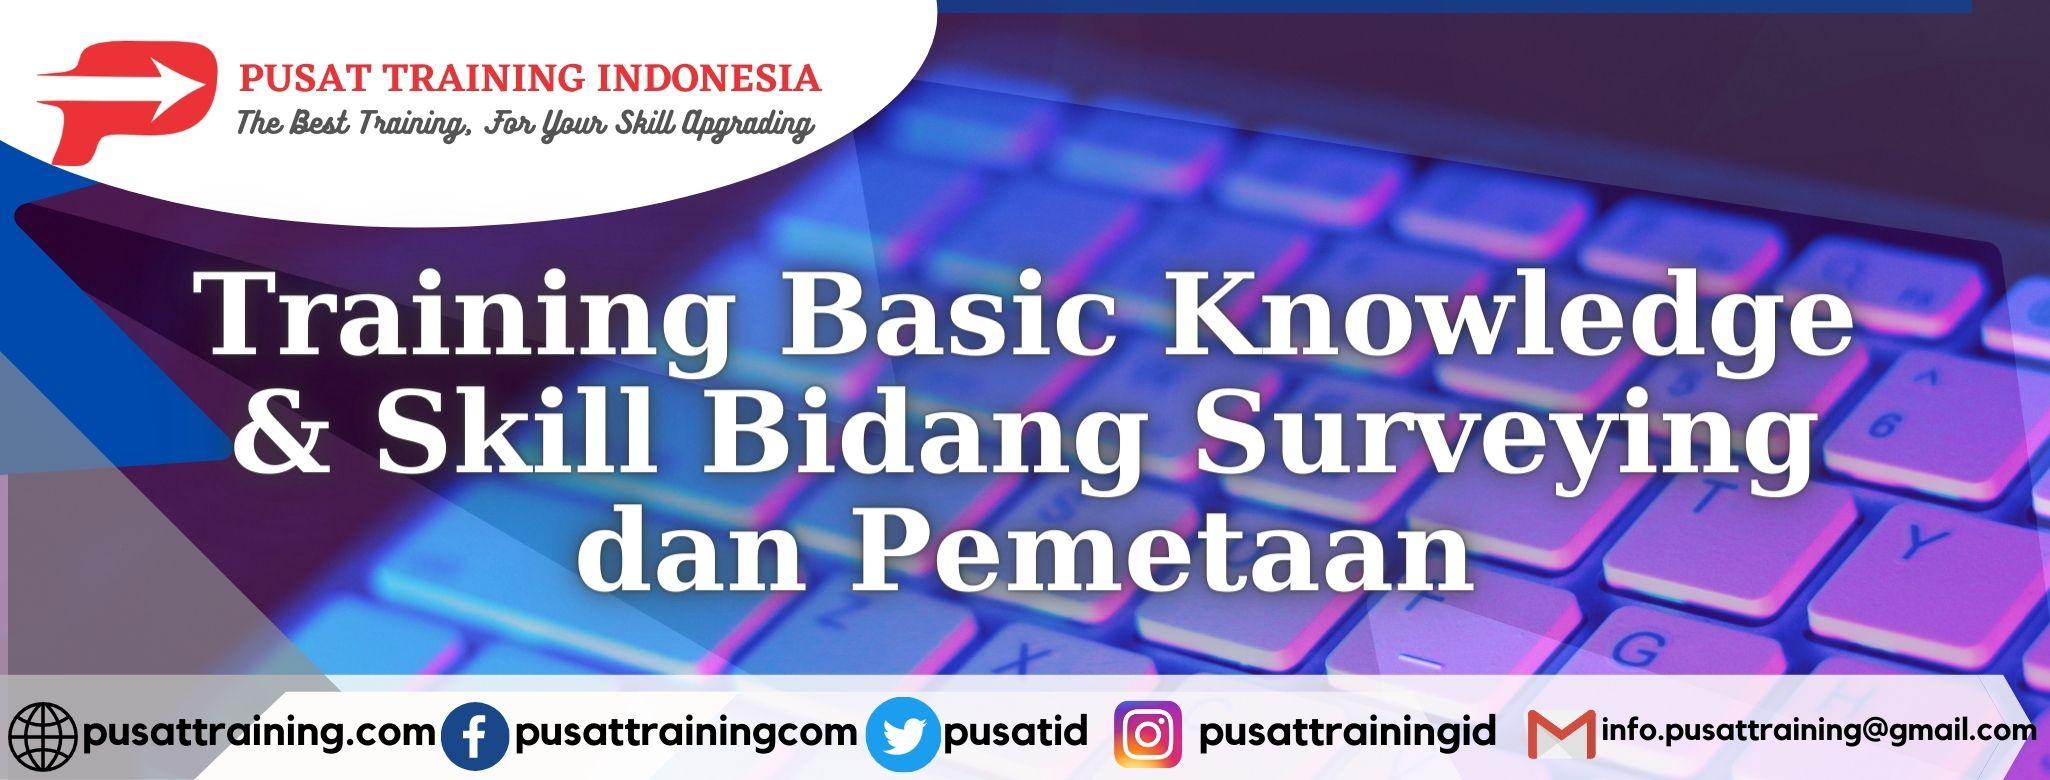 Training-Basic-Knowledge-Skill-Bidang-Surveying-dan-Pemetaan